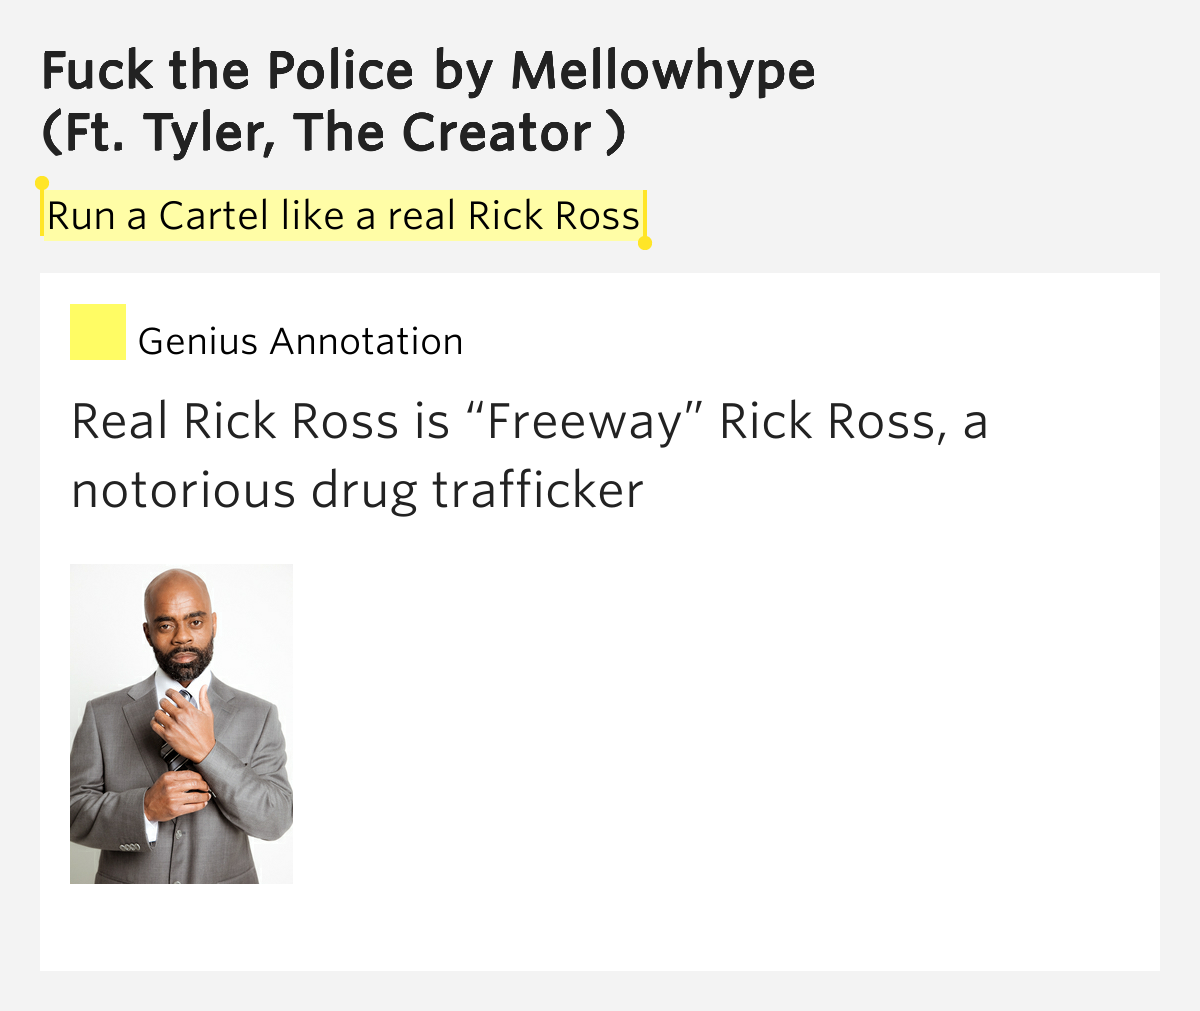 Fuck the police song lyrics